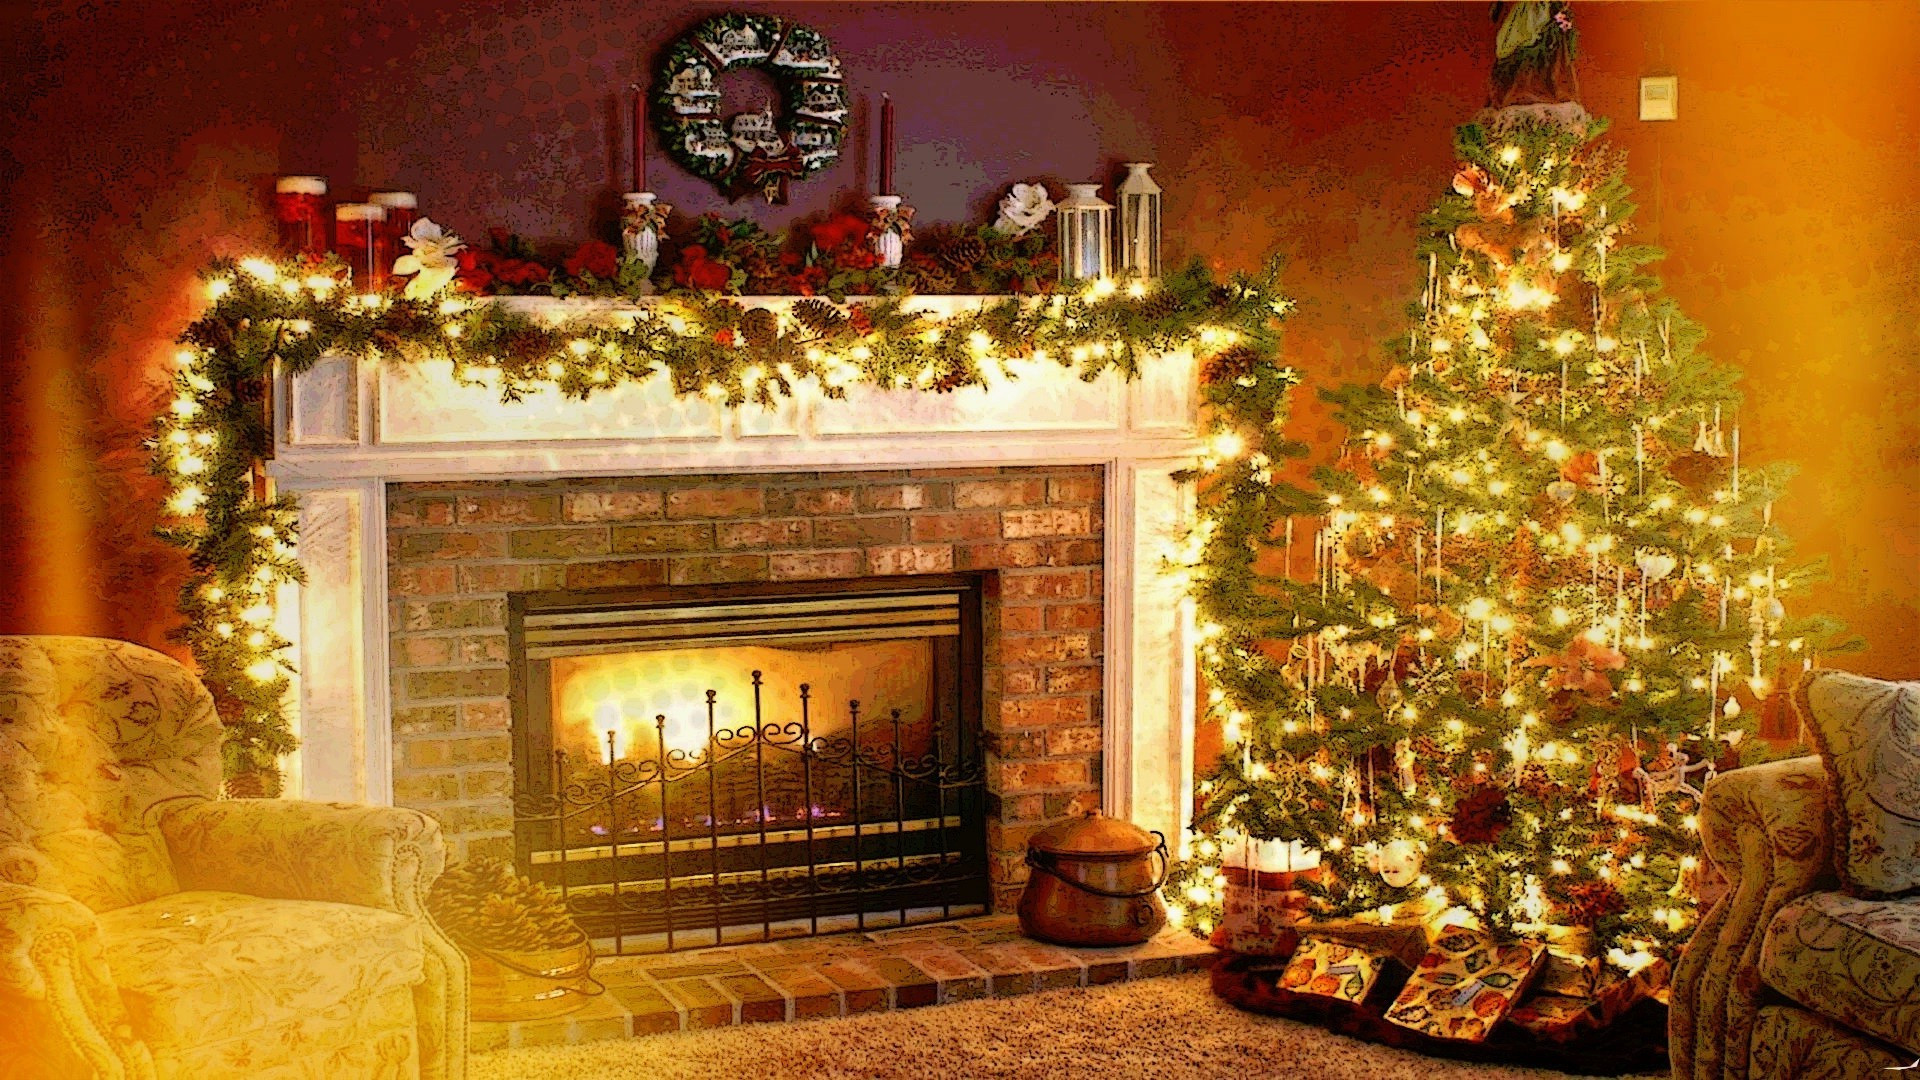 Christmas Wallpaper Fireplace  Christmas Fireplace Background ·① WallpaperTag